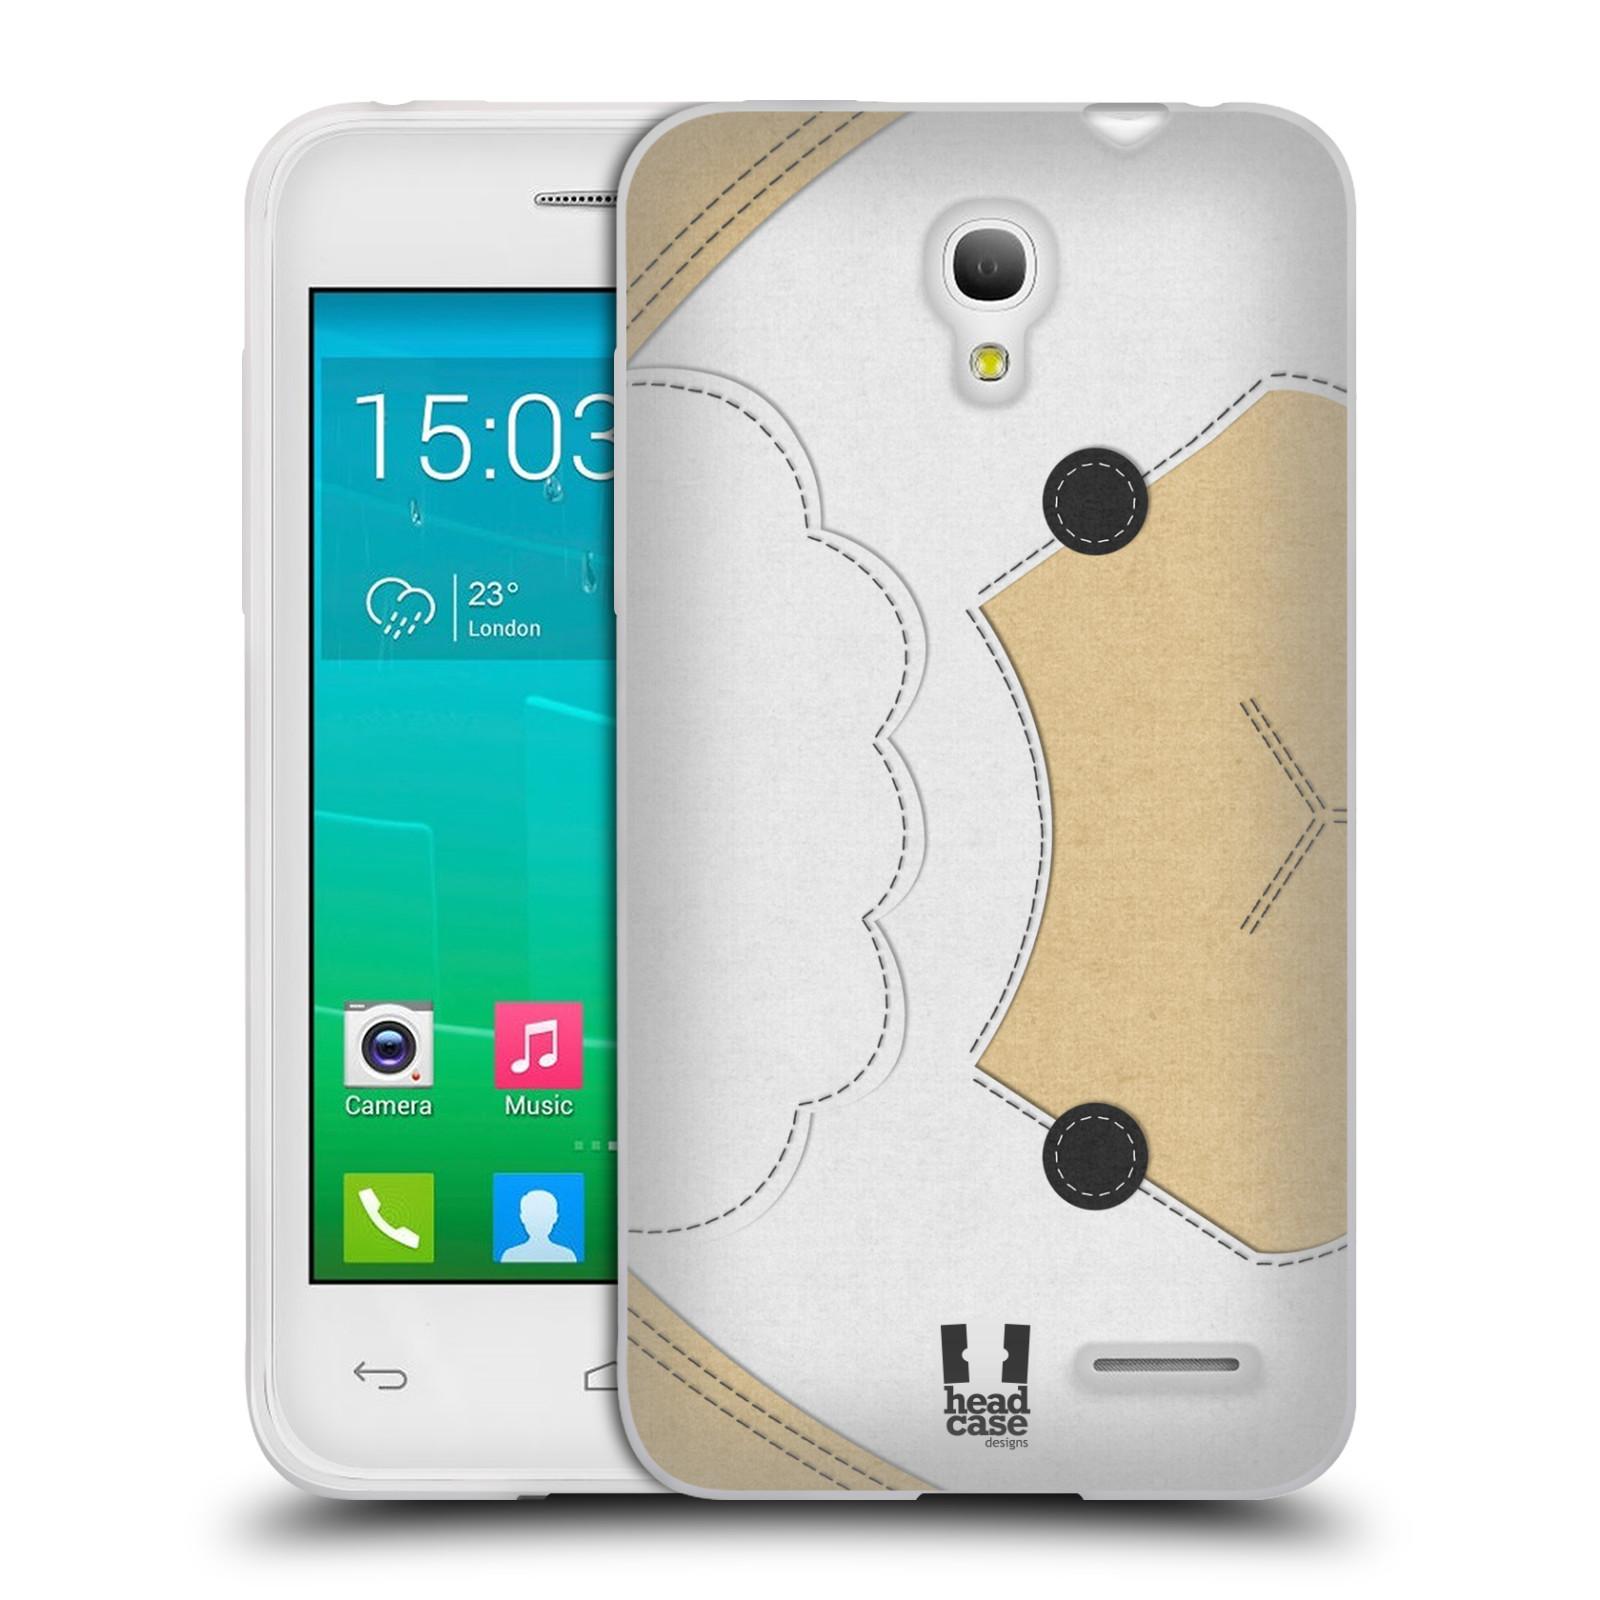 HEAD CASE silikonový obal na mobil Alcatel POP S3 OT-5050Y vzor zvířecí nášivka ovečka